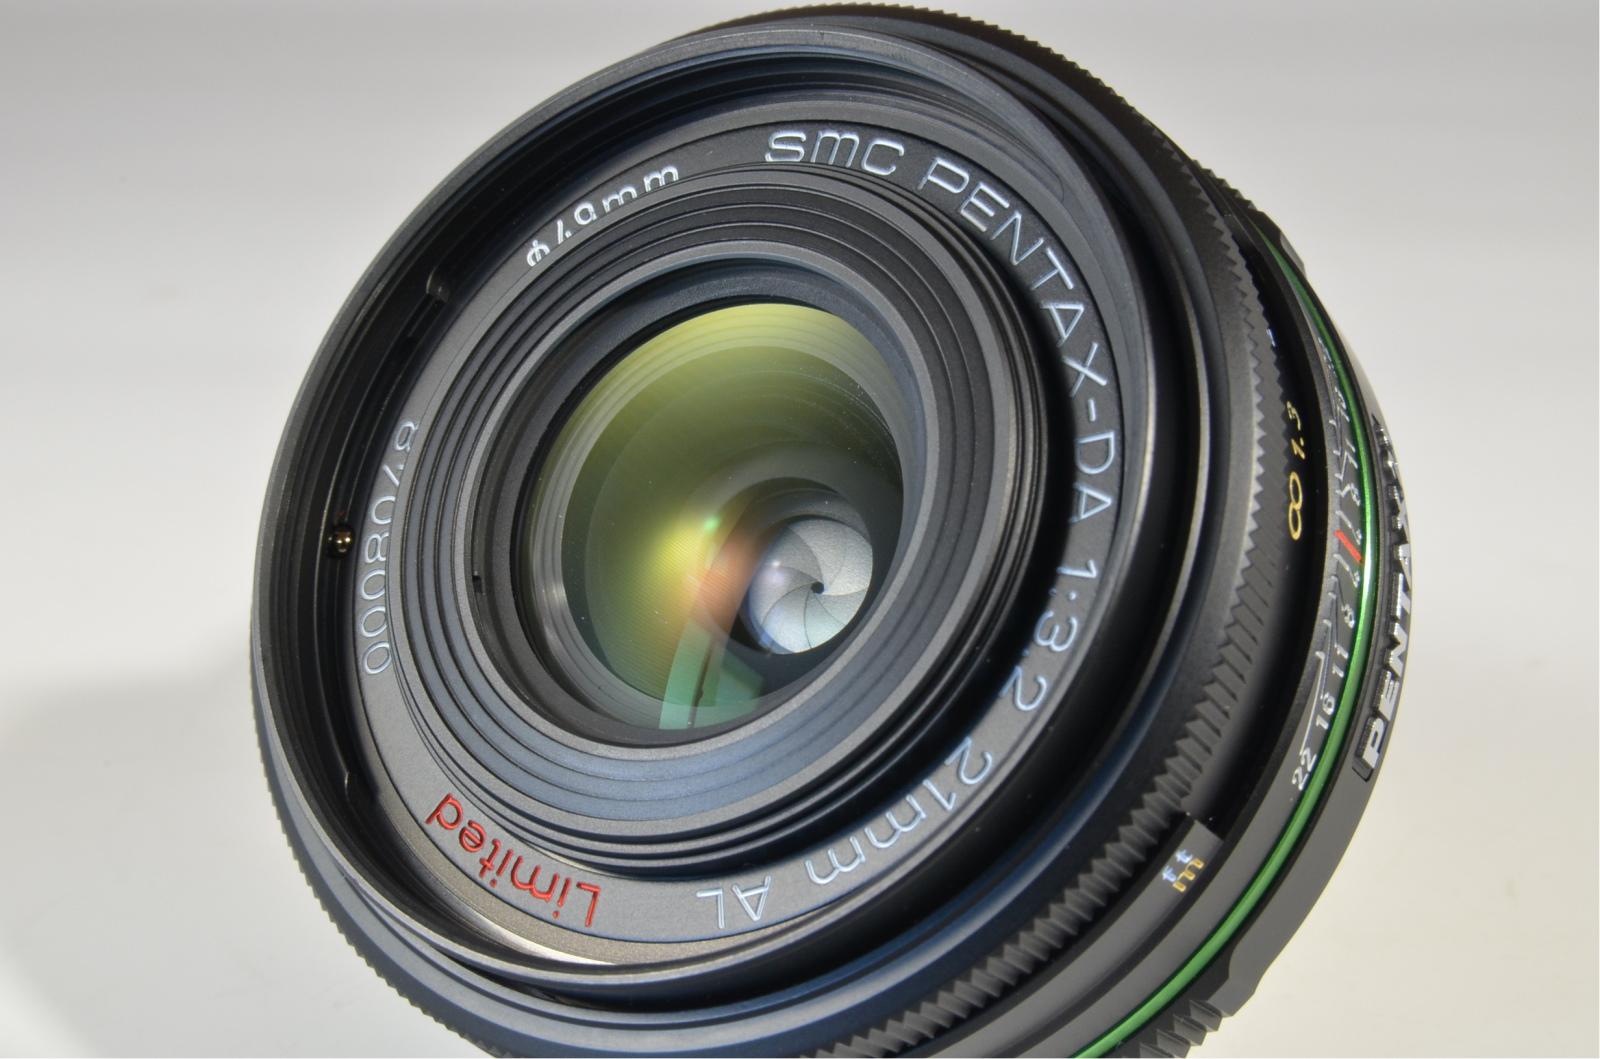 pentax smc da 21mm f3.2 al limited